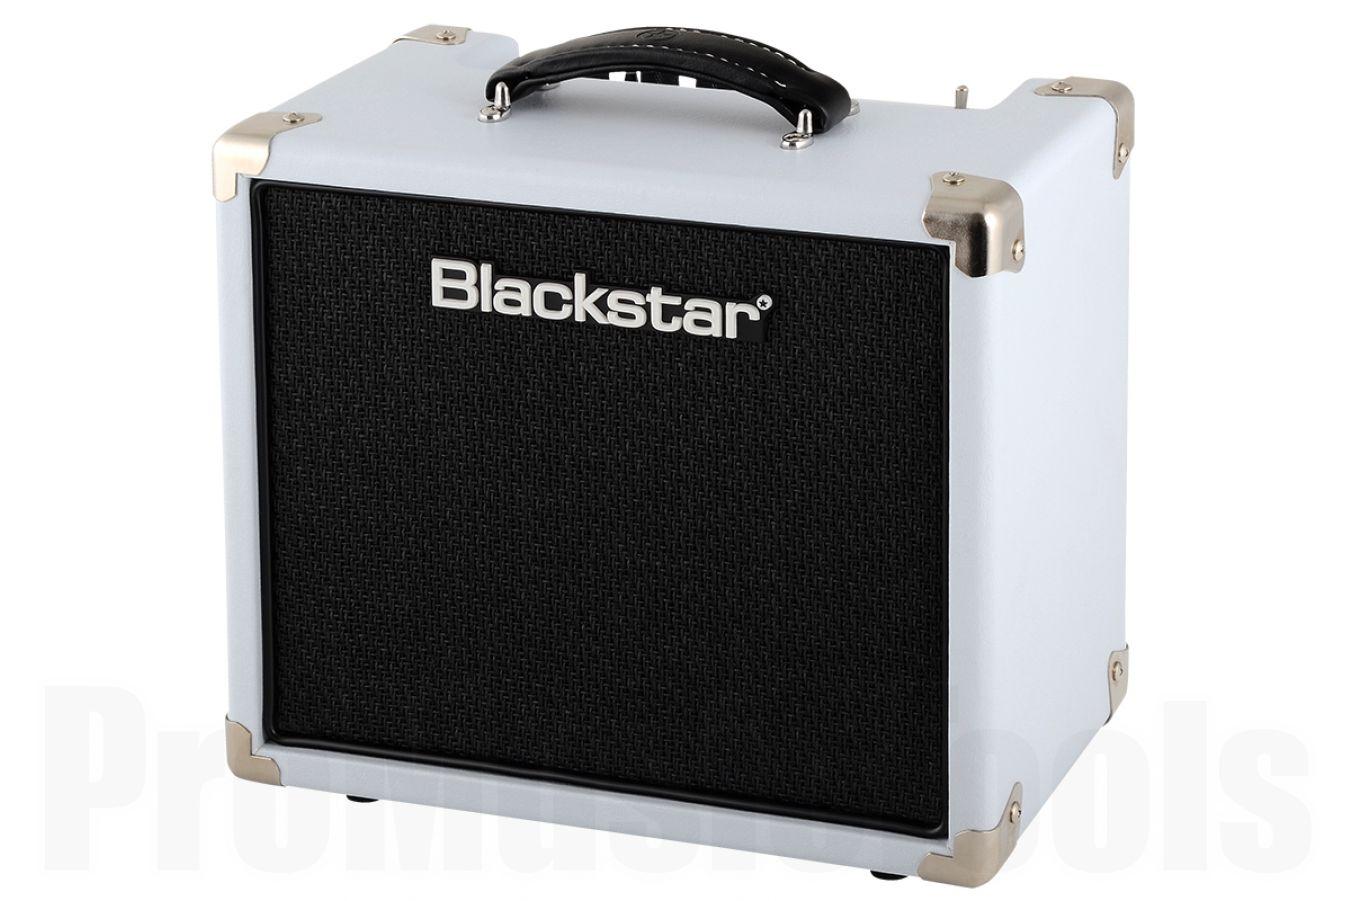 Blackstar HT-1R-W Combo - Limited Edition